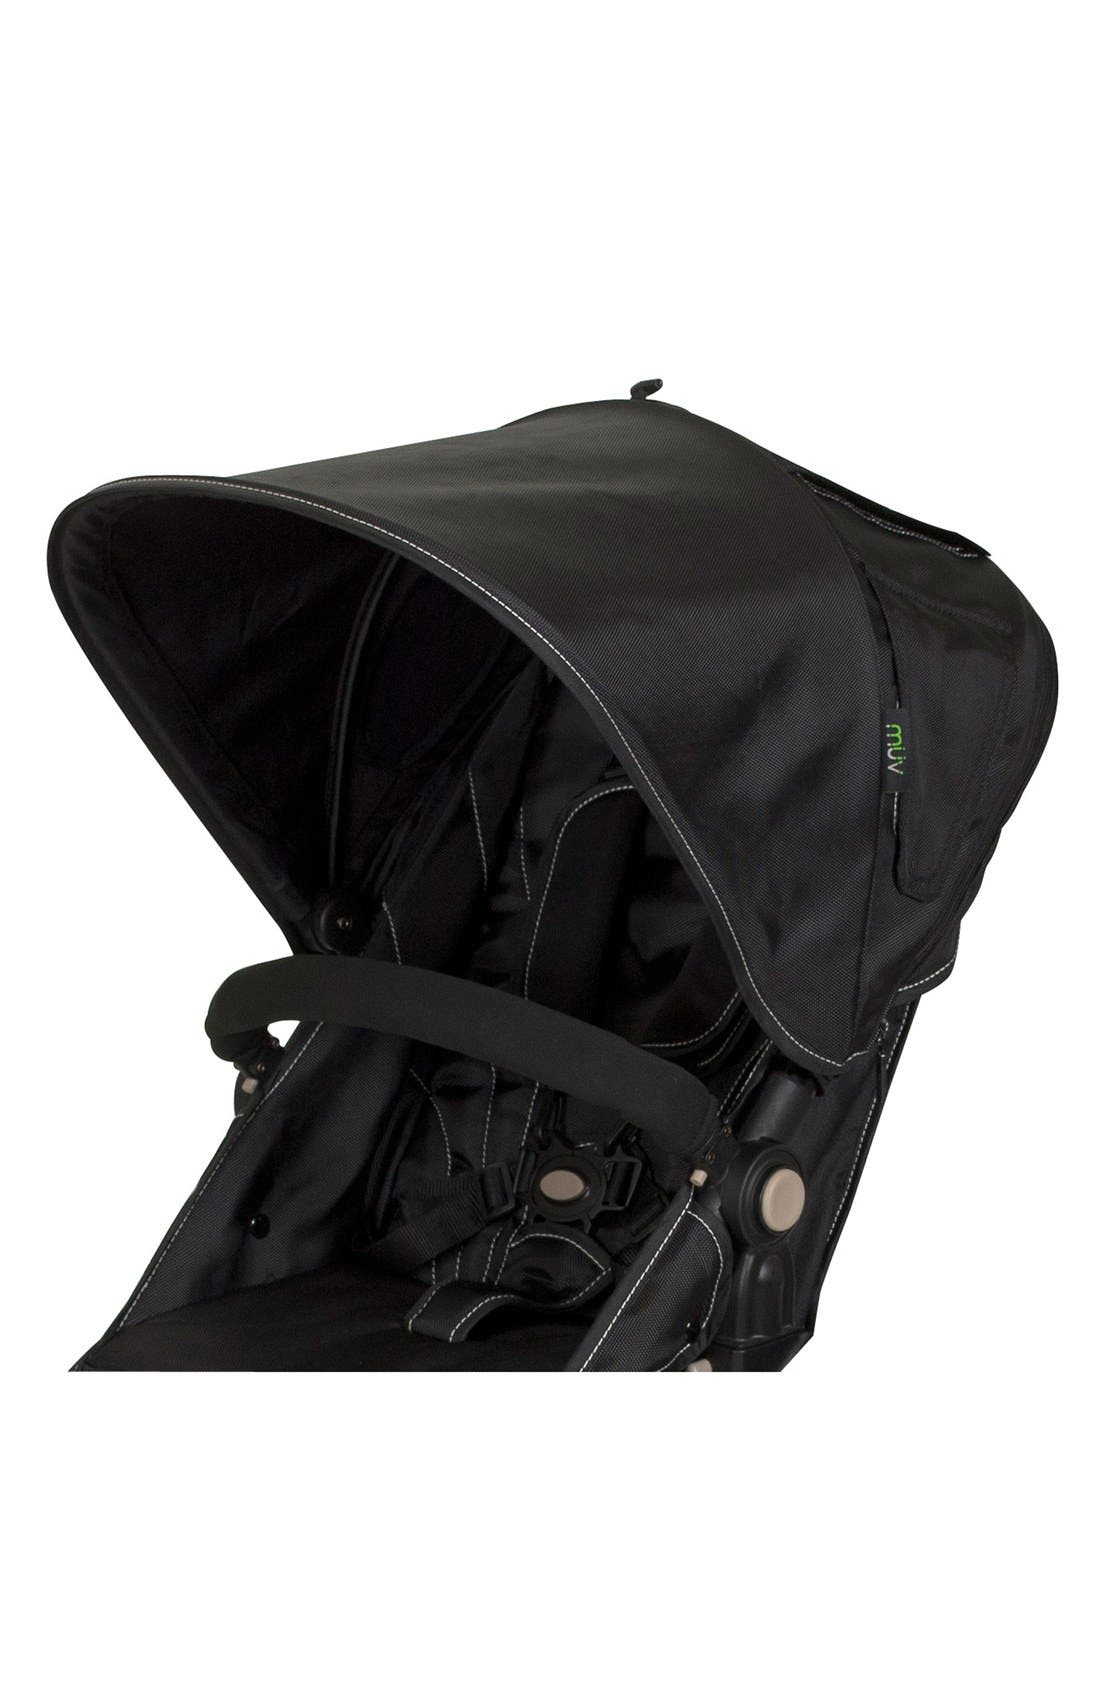 KOEPEL Stroller Canopy,                         Main,                         color, Mystic Black